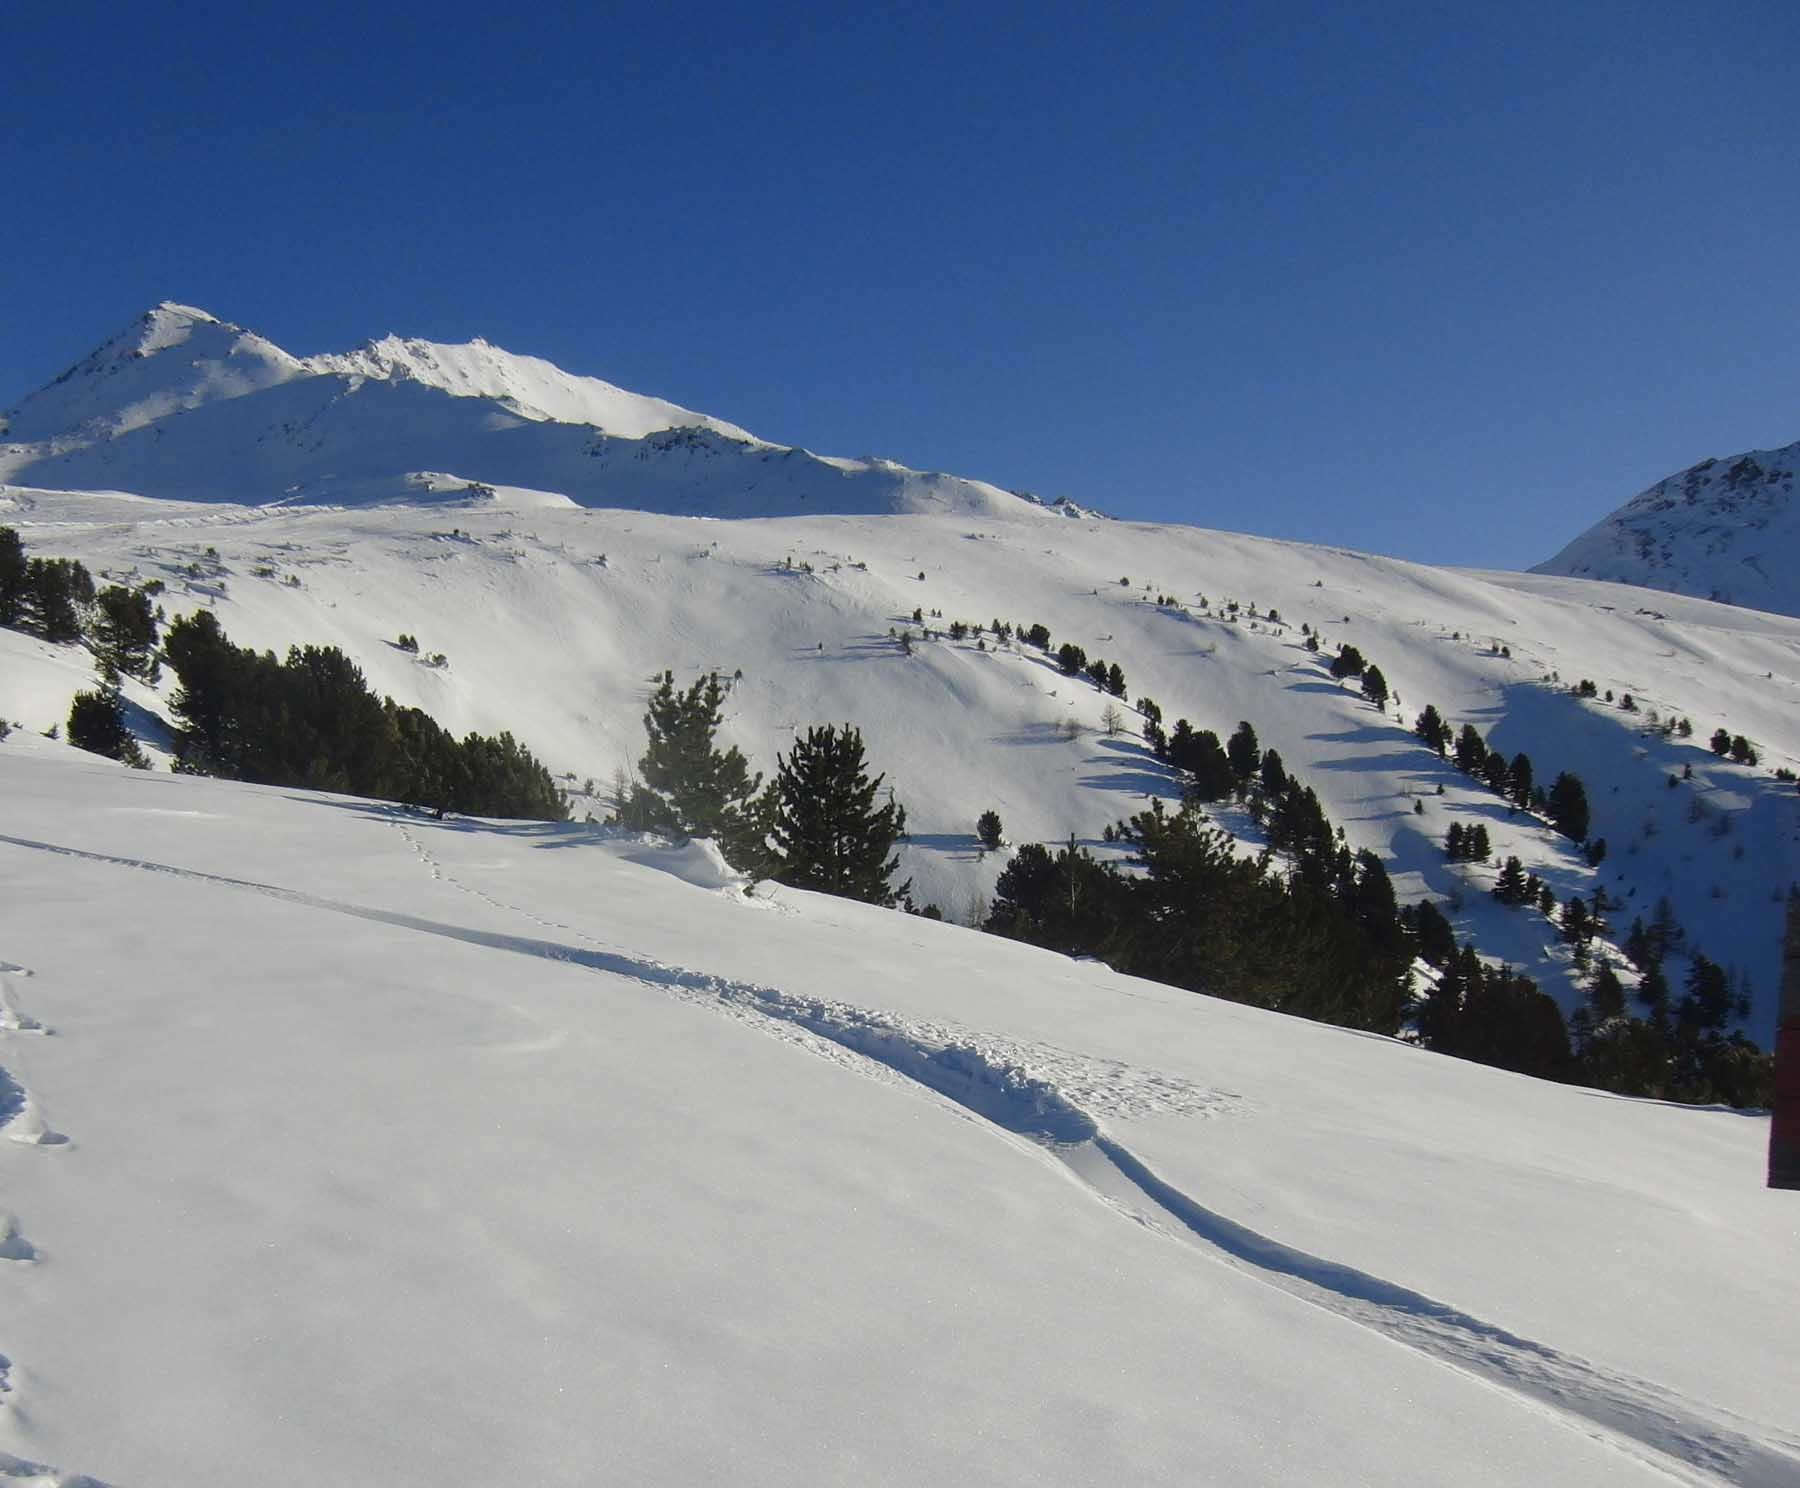 Petit Mont Cenis (Signal du) da Termignon per il Versante Ovest 2020-01-02